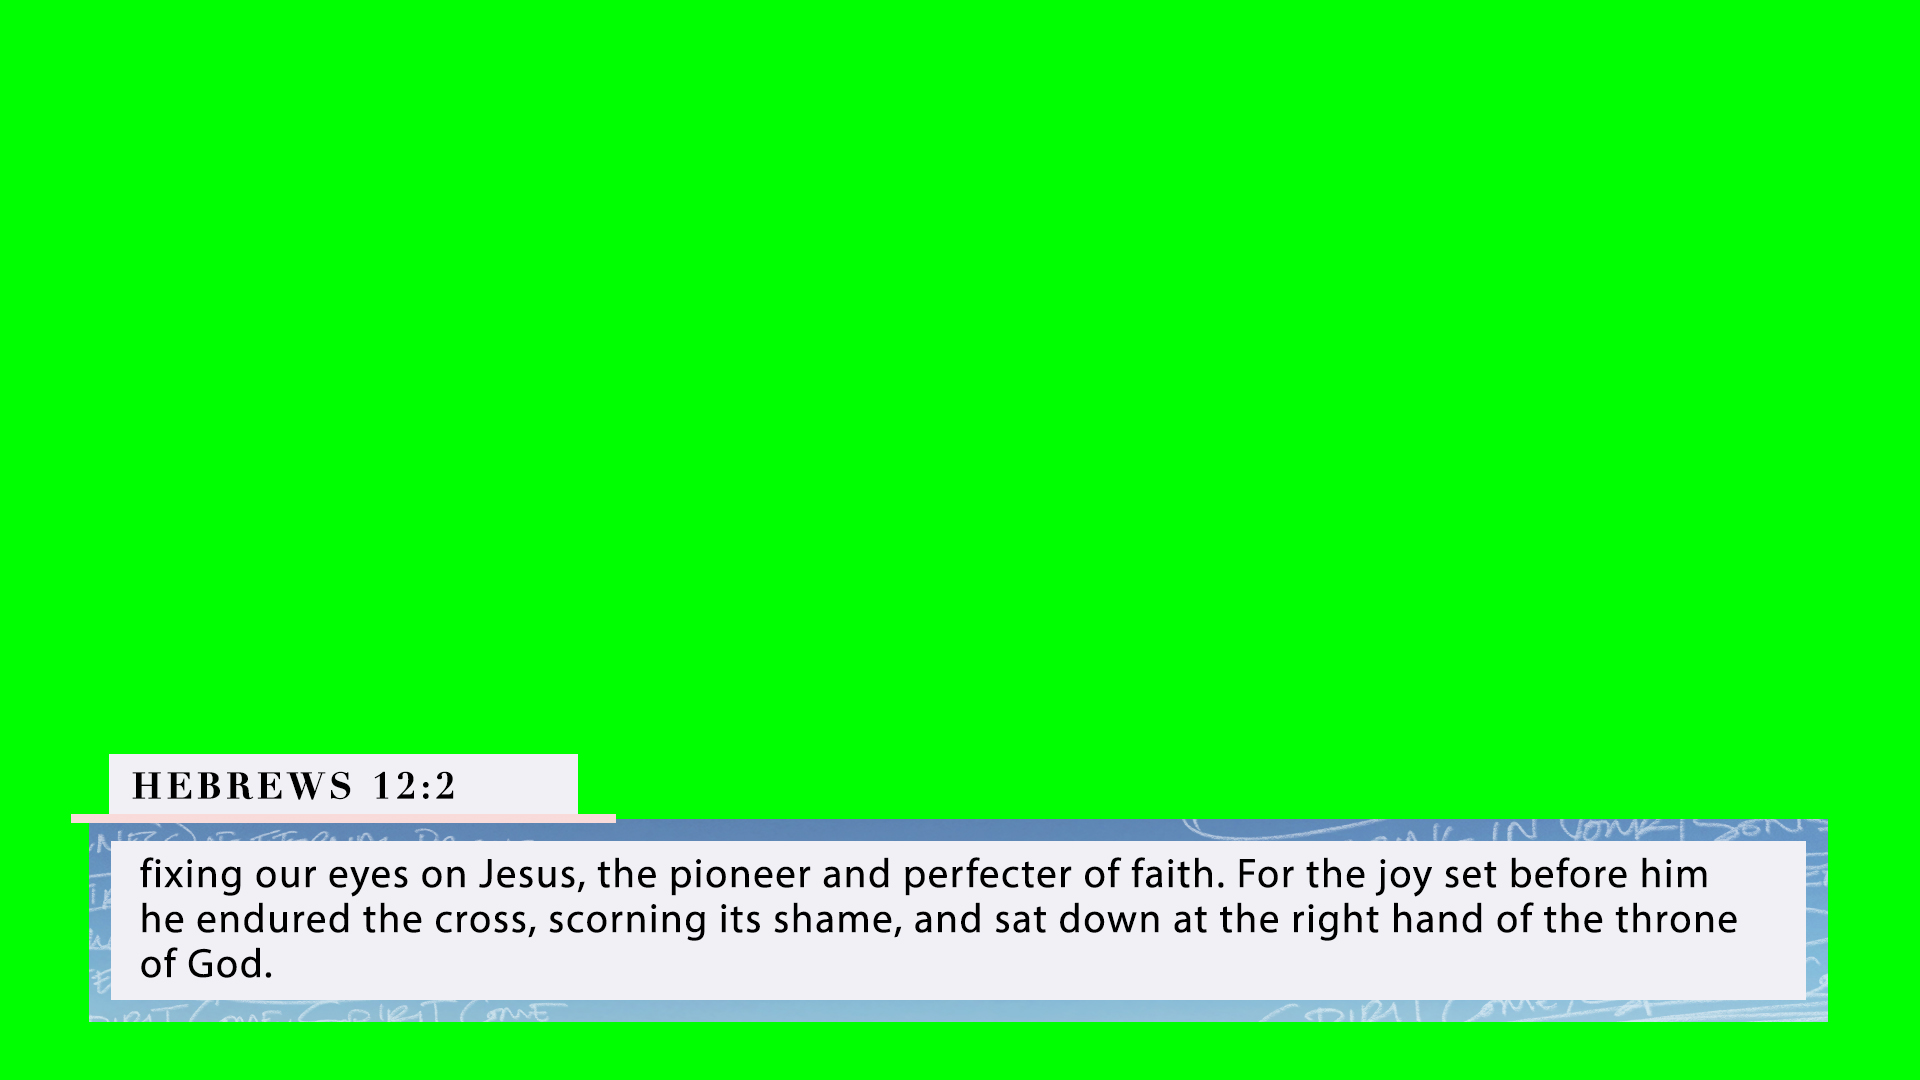 Hebrews 12:2 (JPG)